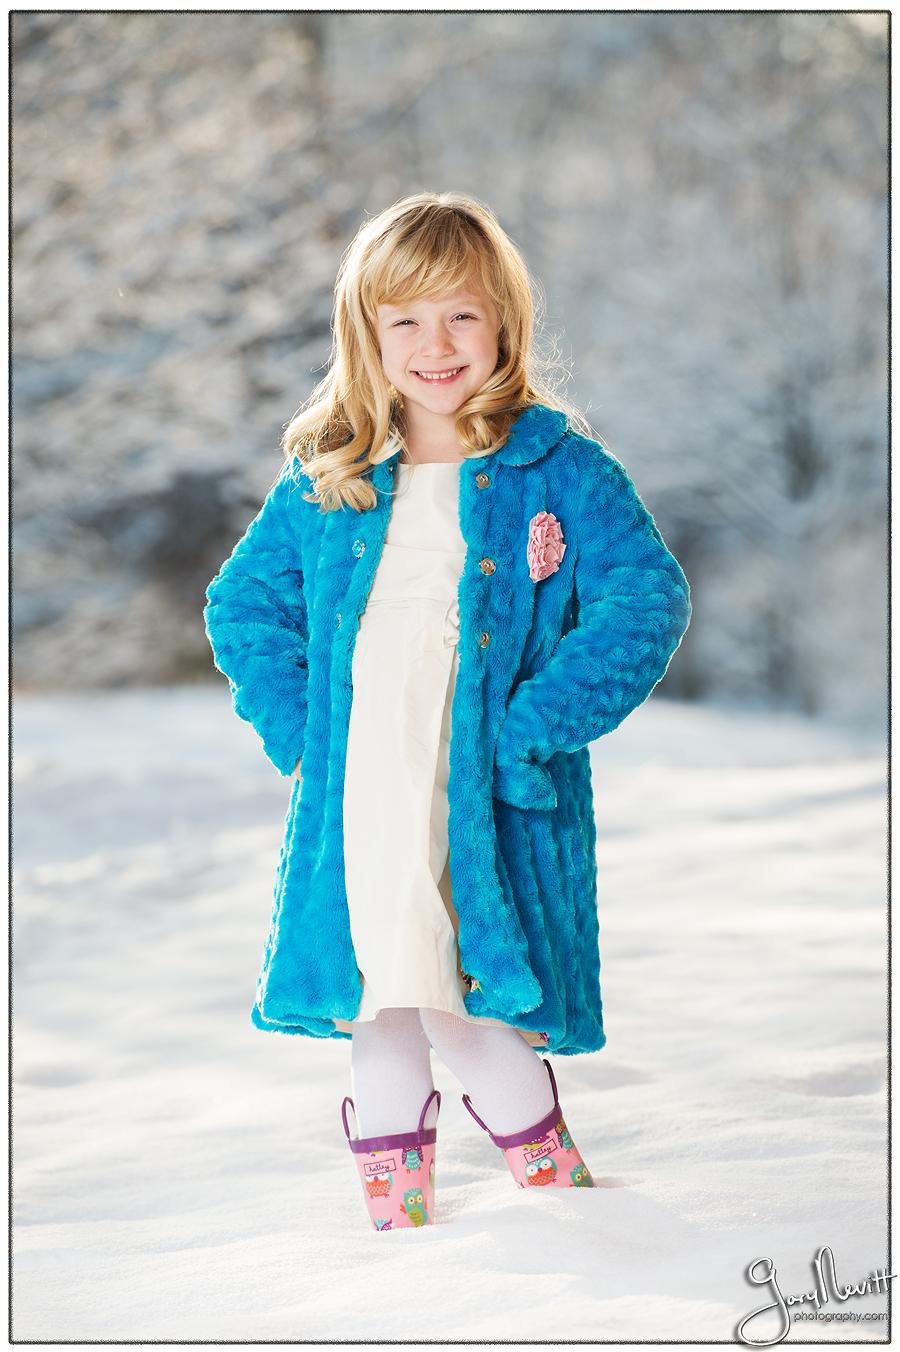 6 year old girl photography - Snow portrait - Philadelphia- Gary Nevitt Photography-177